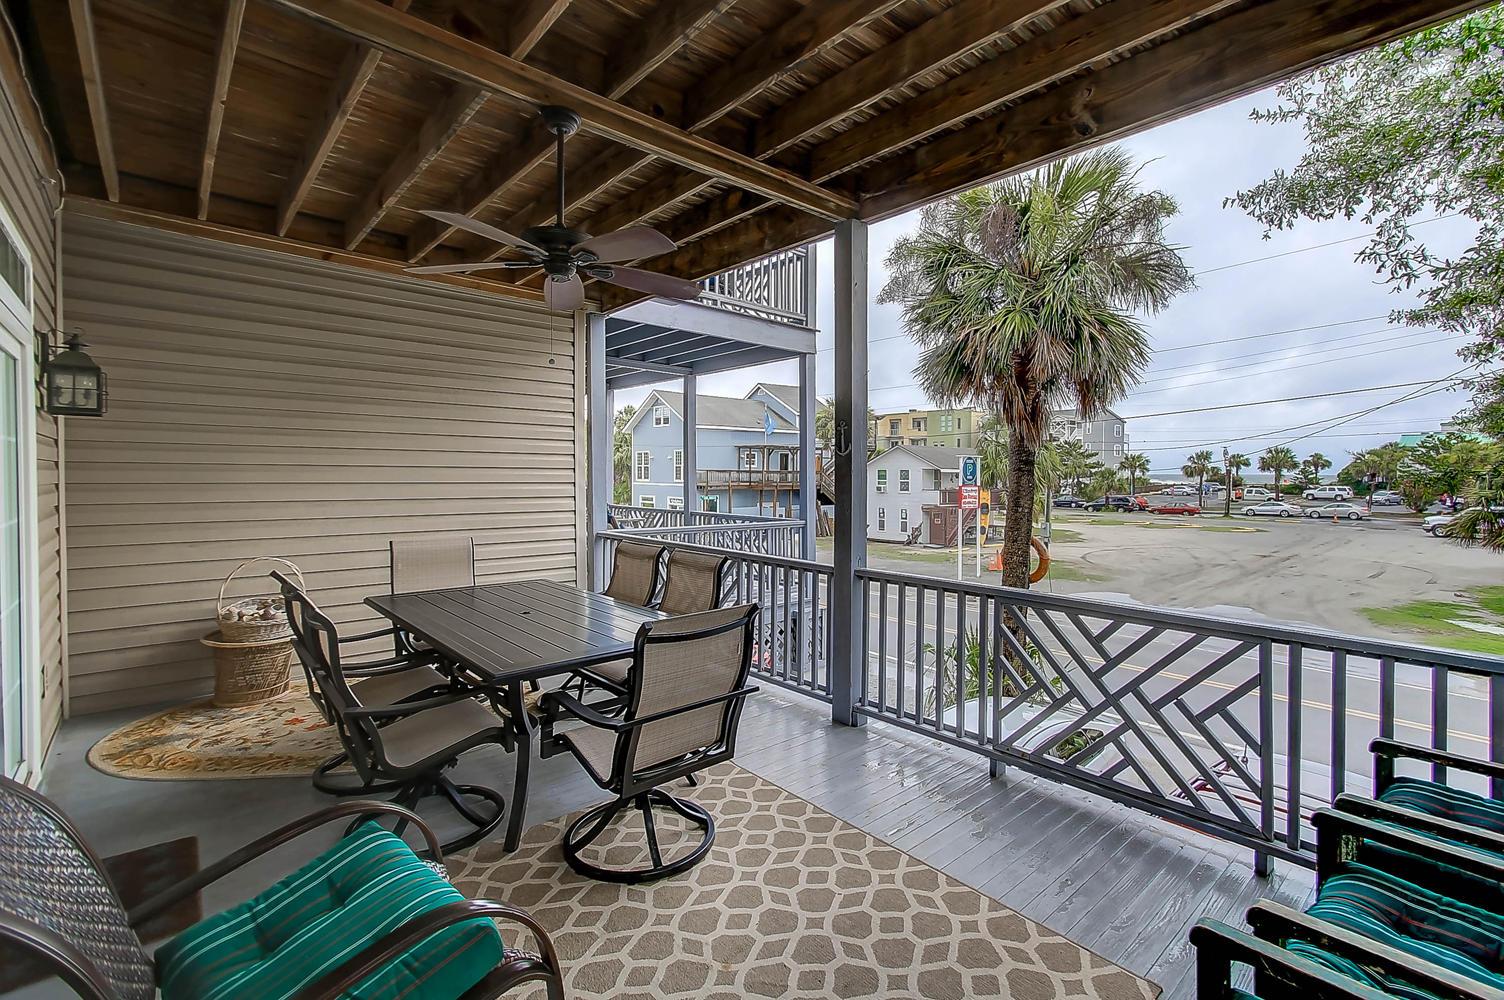 Beachwalker Villas Homes For Sale - 108 Ashley, Folly Beach, SC - 21